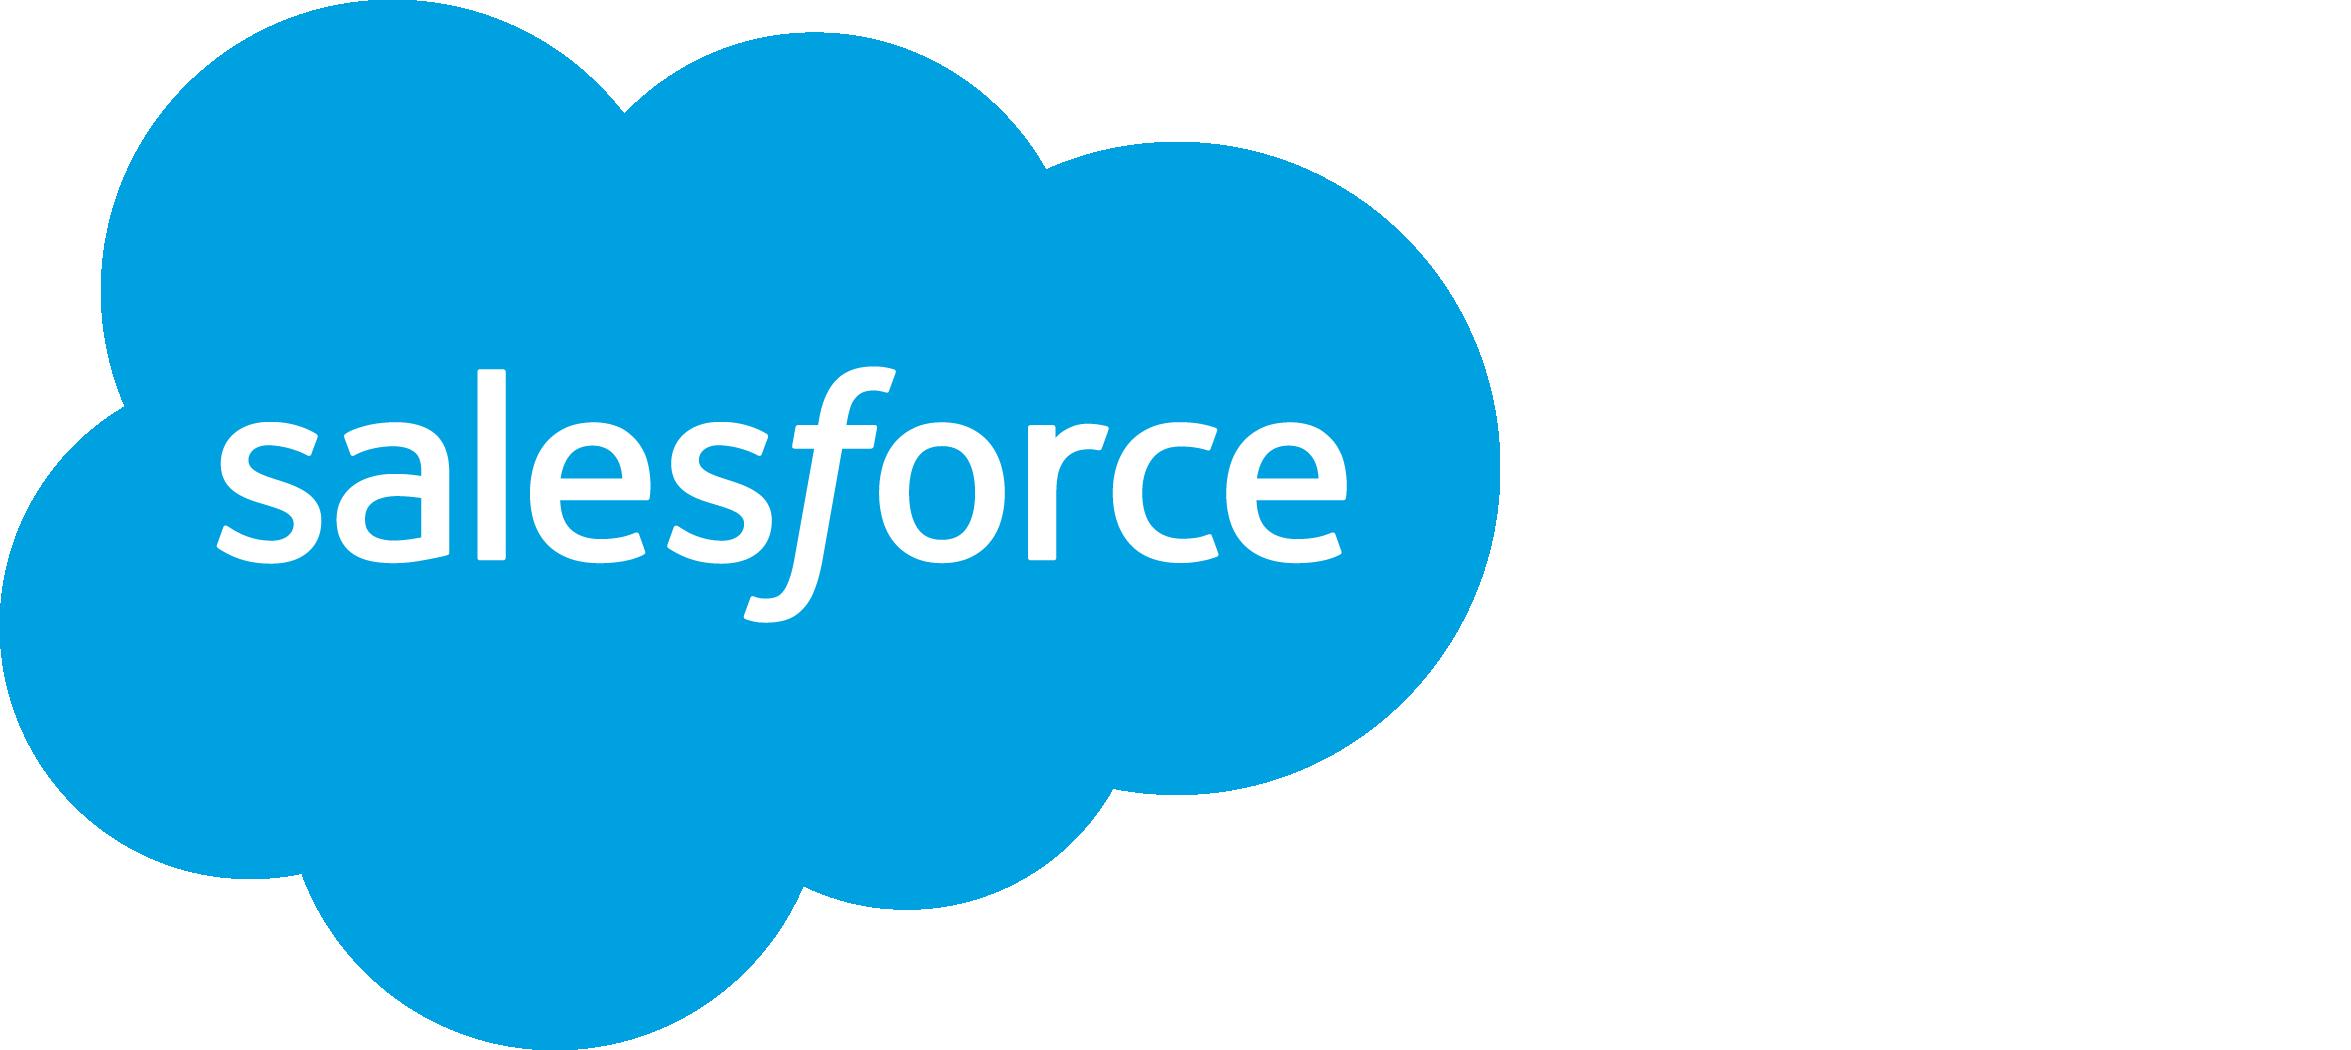 Salesforce trust.png